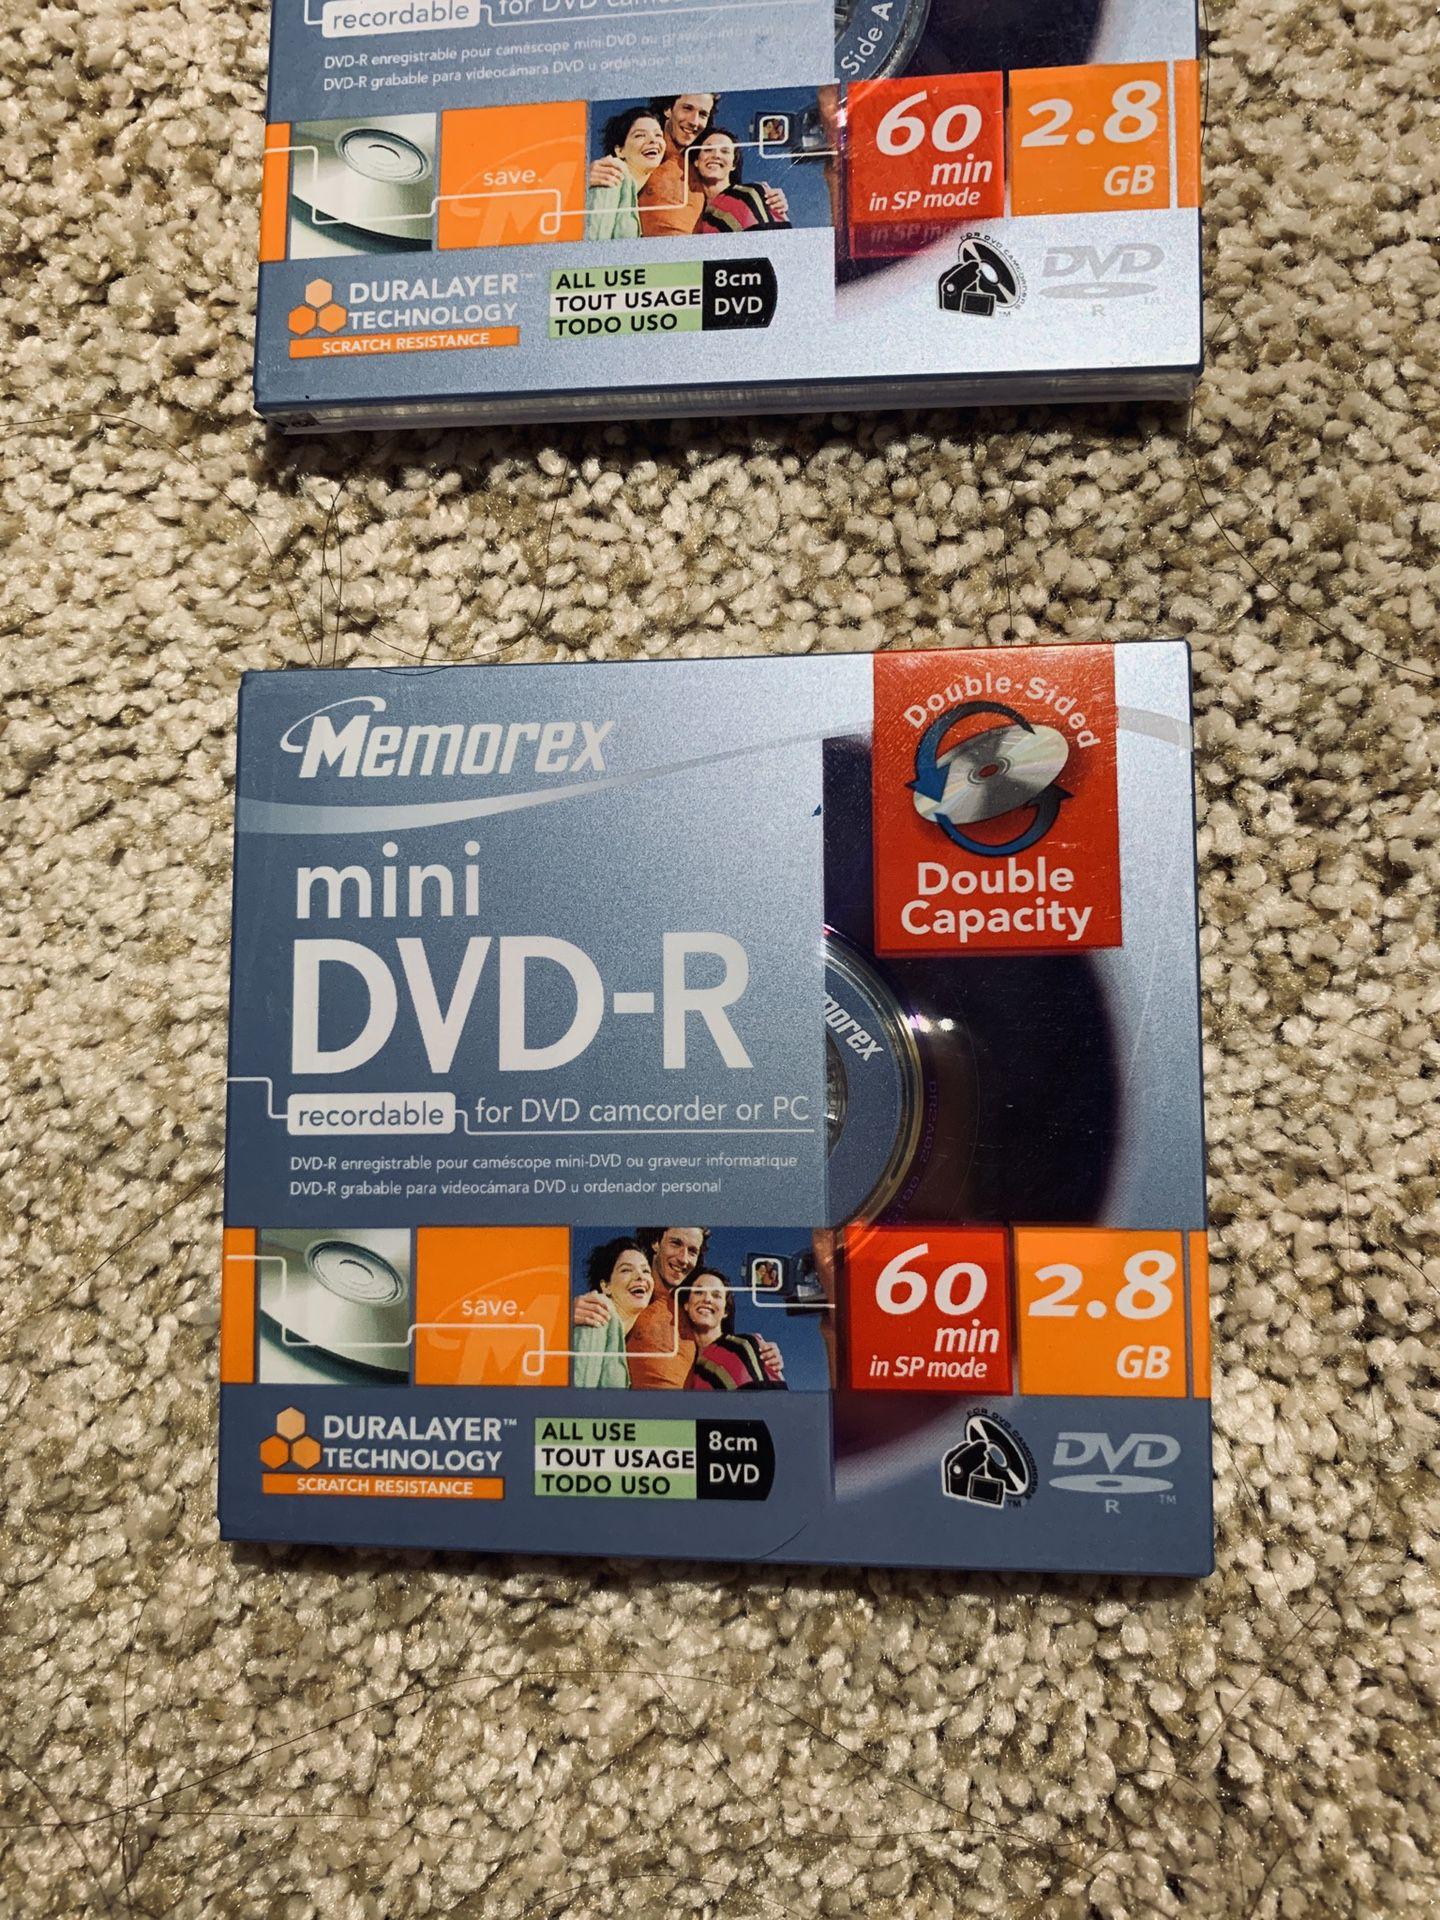 Memorex Mini DVD-R Recordable